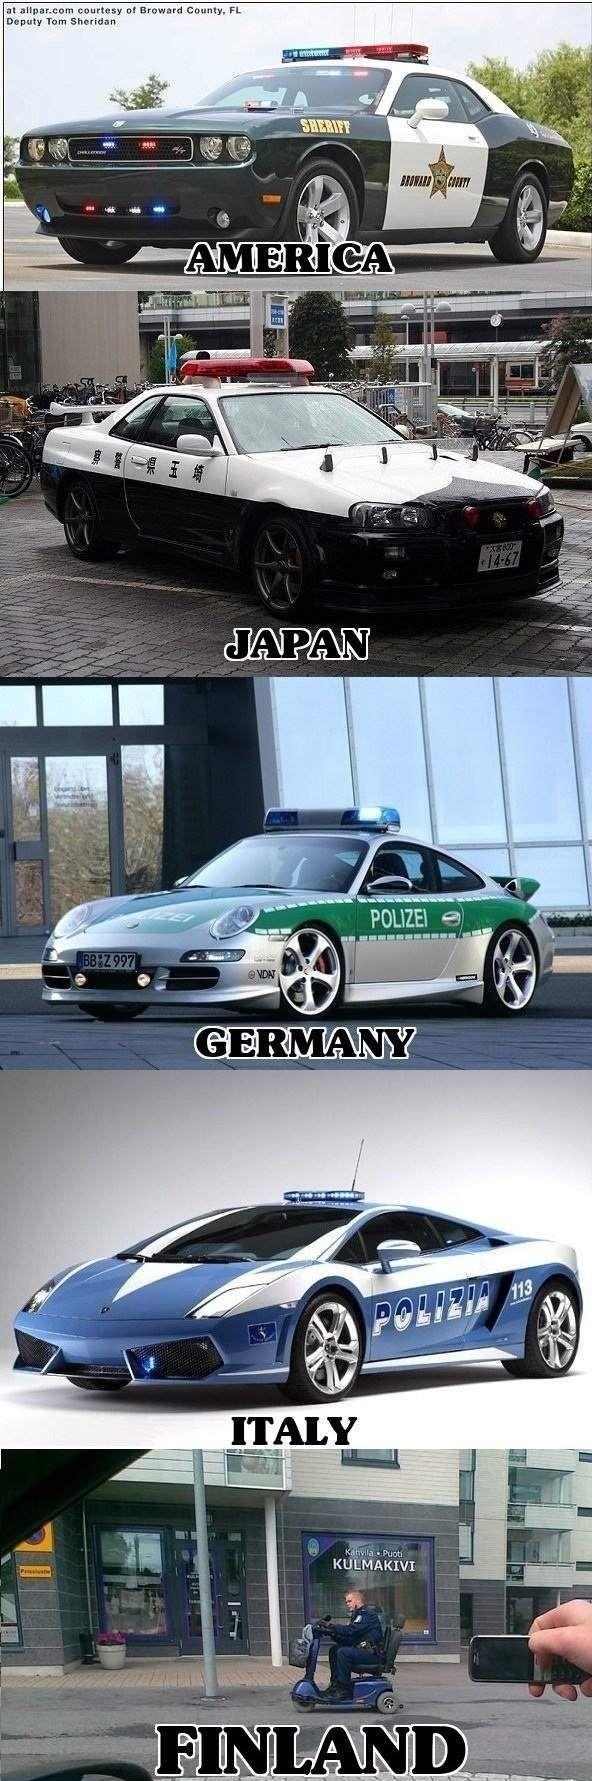 Police car !!! ✏✏✏✏✏✏✏✏✏✏✏✏✏✏✏✏ AUTRES VEHICULES - OTHER VEHICLES ☞ https://fr.pinterest.com/barbierjeanf/pin-index-voitures-v%C3%A9hicules/ ══════════════════════ BIJOUX ☞ https://www.facebook.com/media/set/?set=a.1351591571533839&type=1&l=bb0129771f ✏✏✏✏✏✏✏✏✏✏✏✏✏✏✏✏